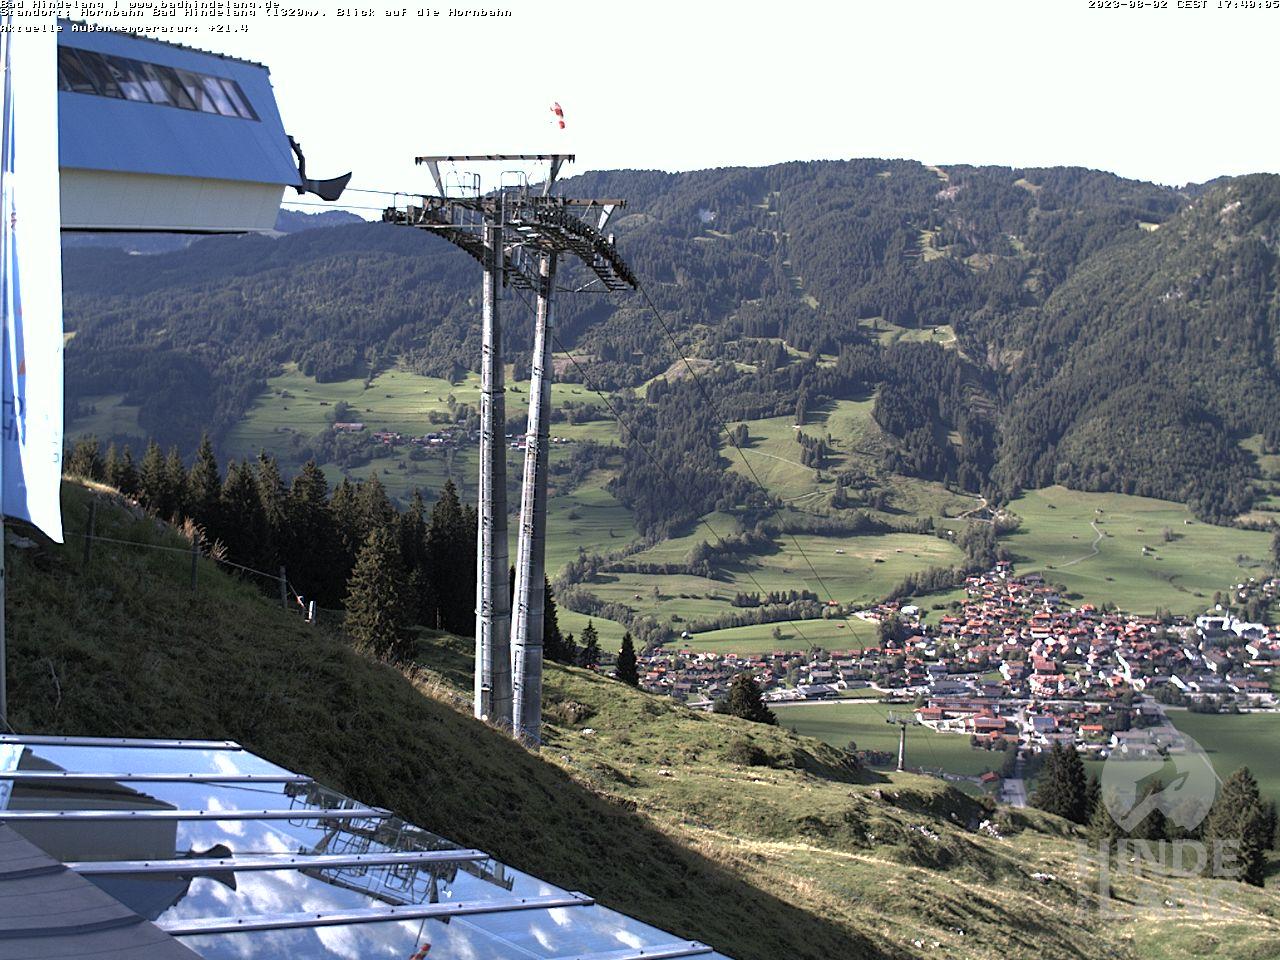 Webcam Bergstation Hindelanger Hornbahn - Ausblick auf die Bergstation der Hornbahn Hindelang (1.320 Meter)